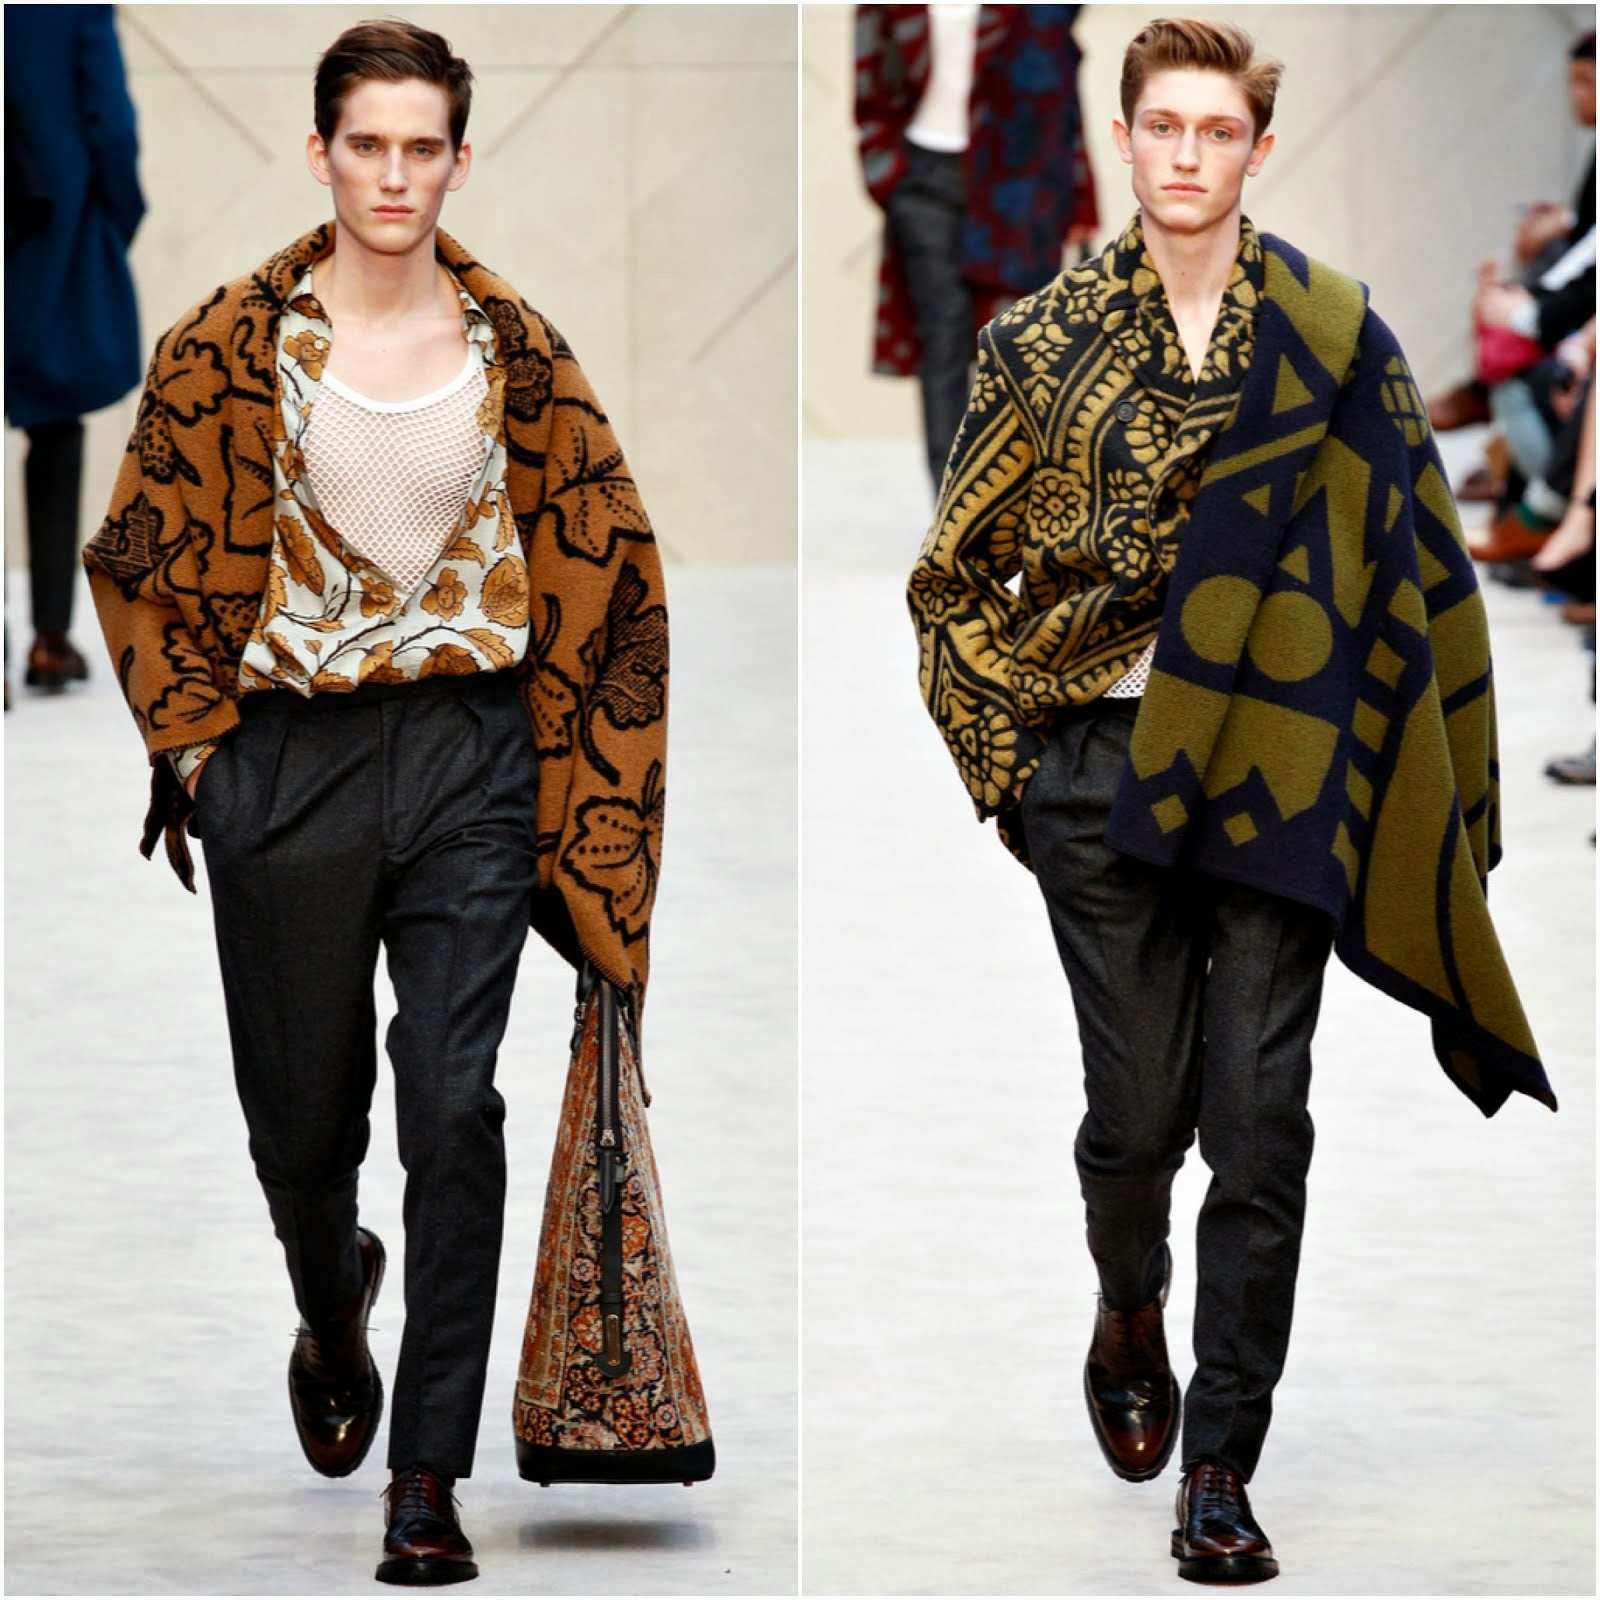 Style stalking Louis-Marie de Castelbajac at the 'Dries Van Noten: Inspirations' Preview